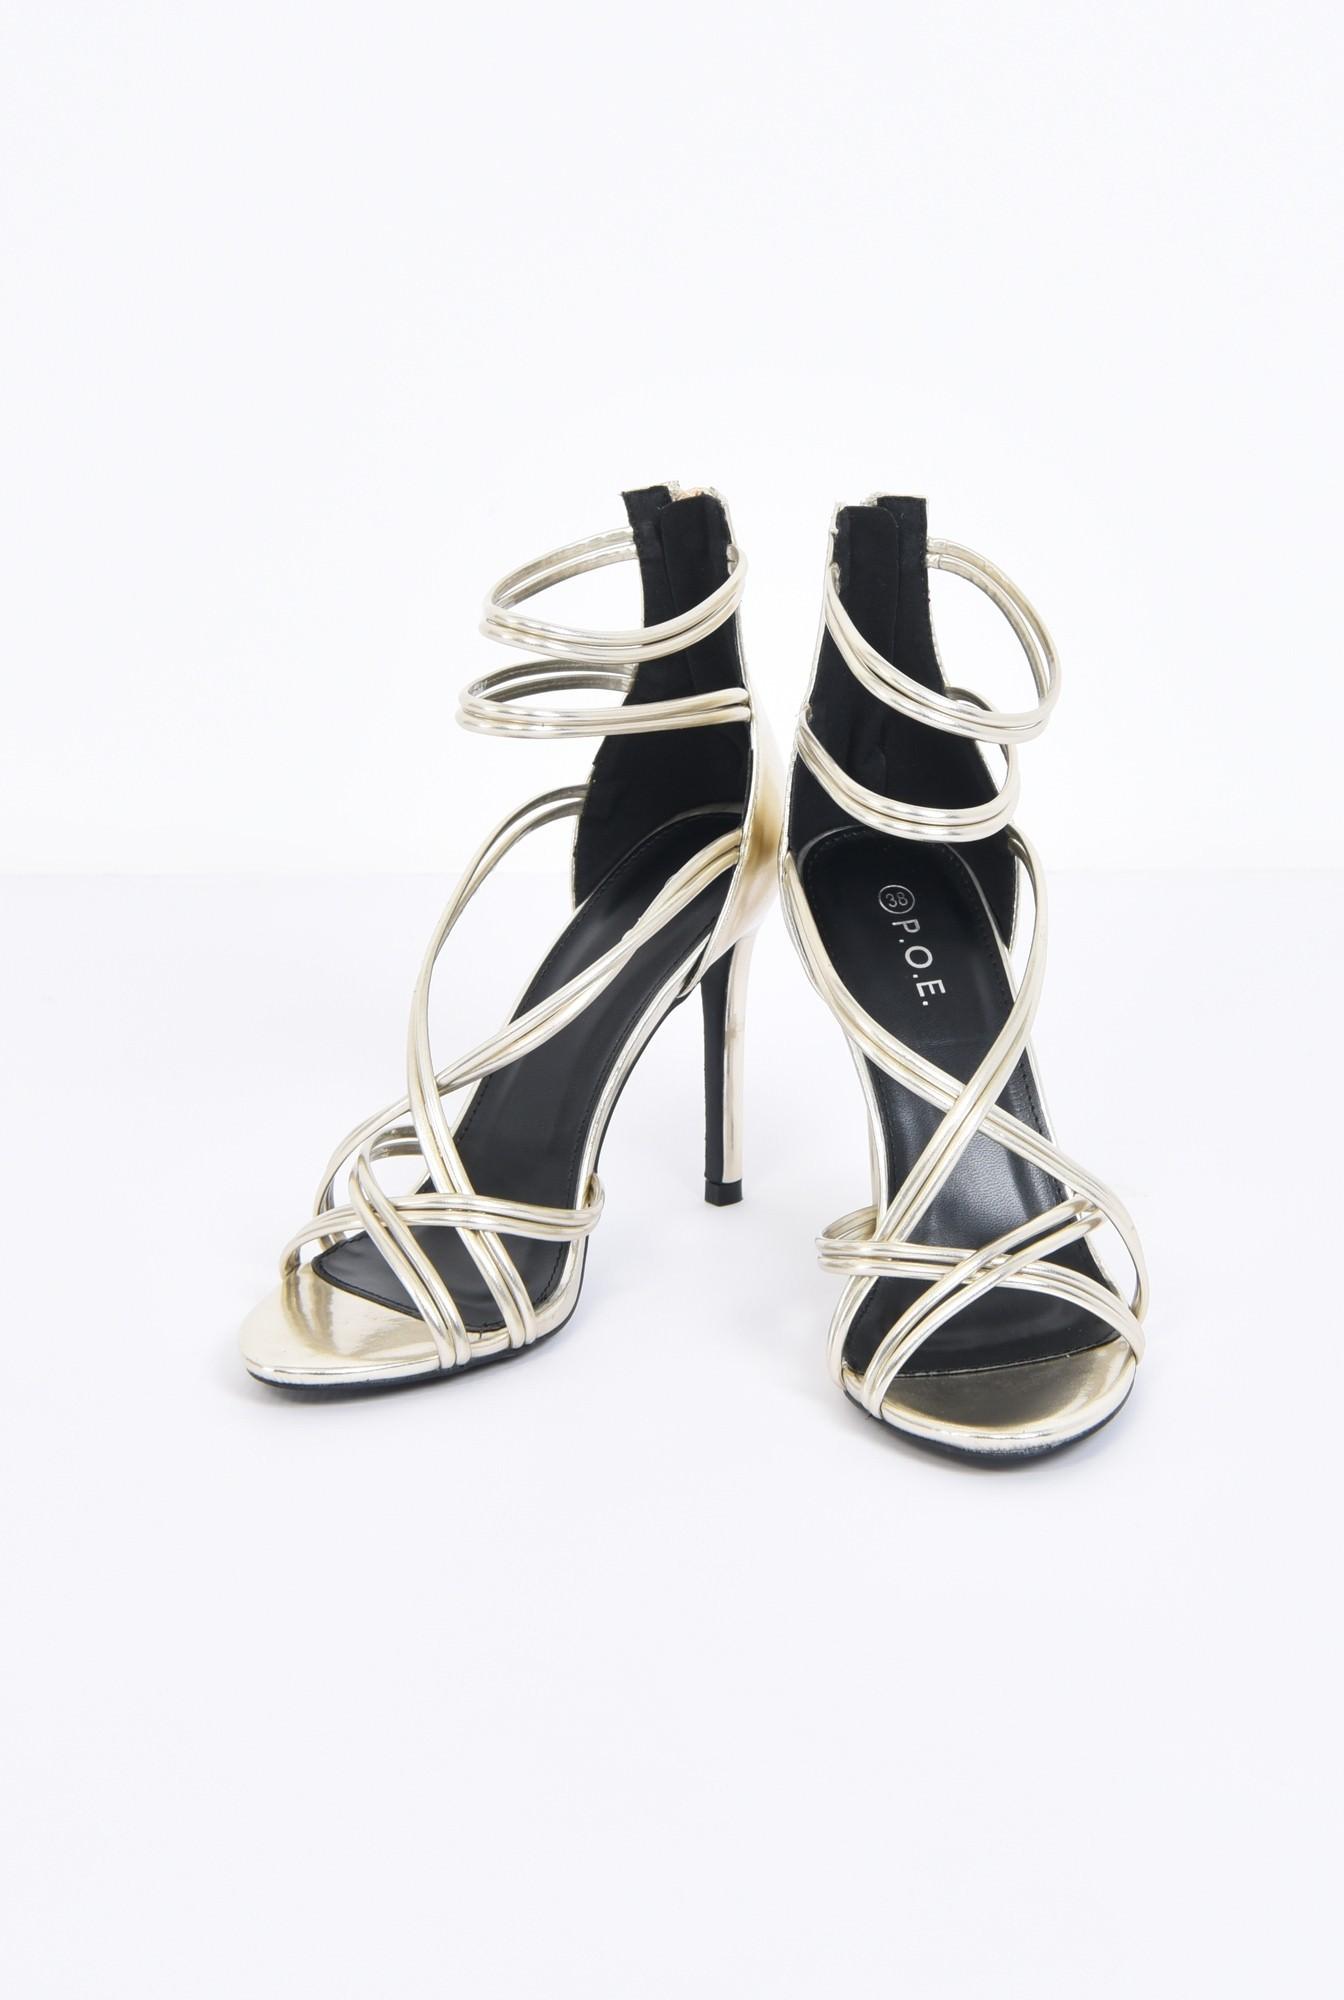 3 - sandale de ocazie, toc inalt, barete subtiri